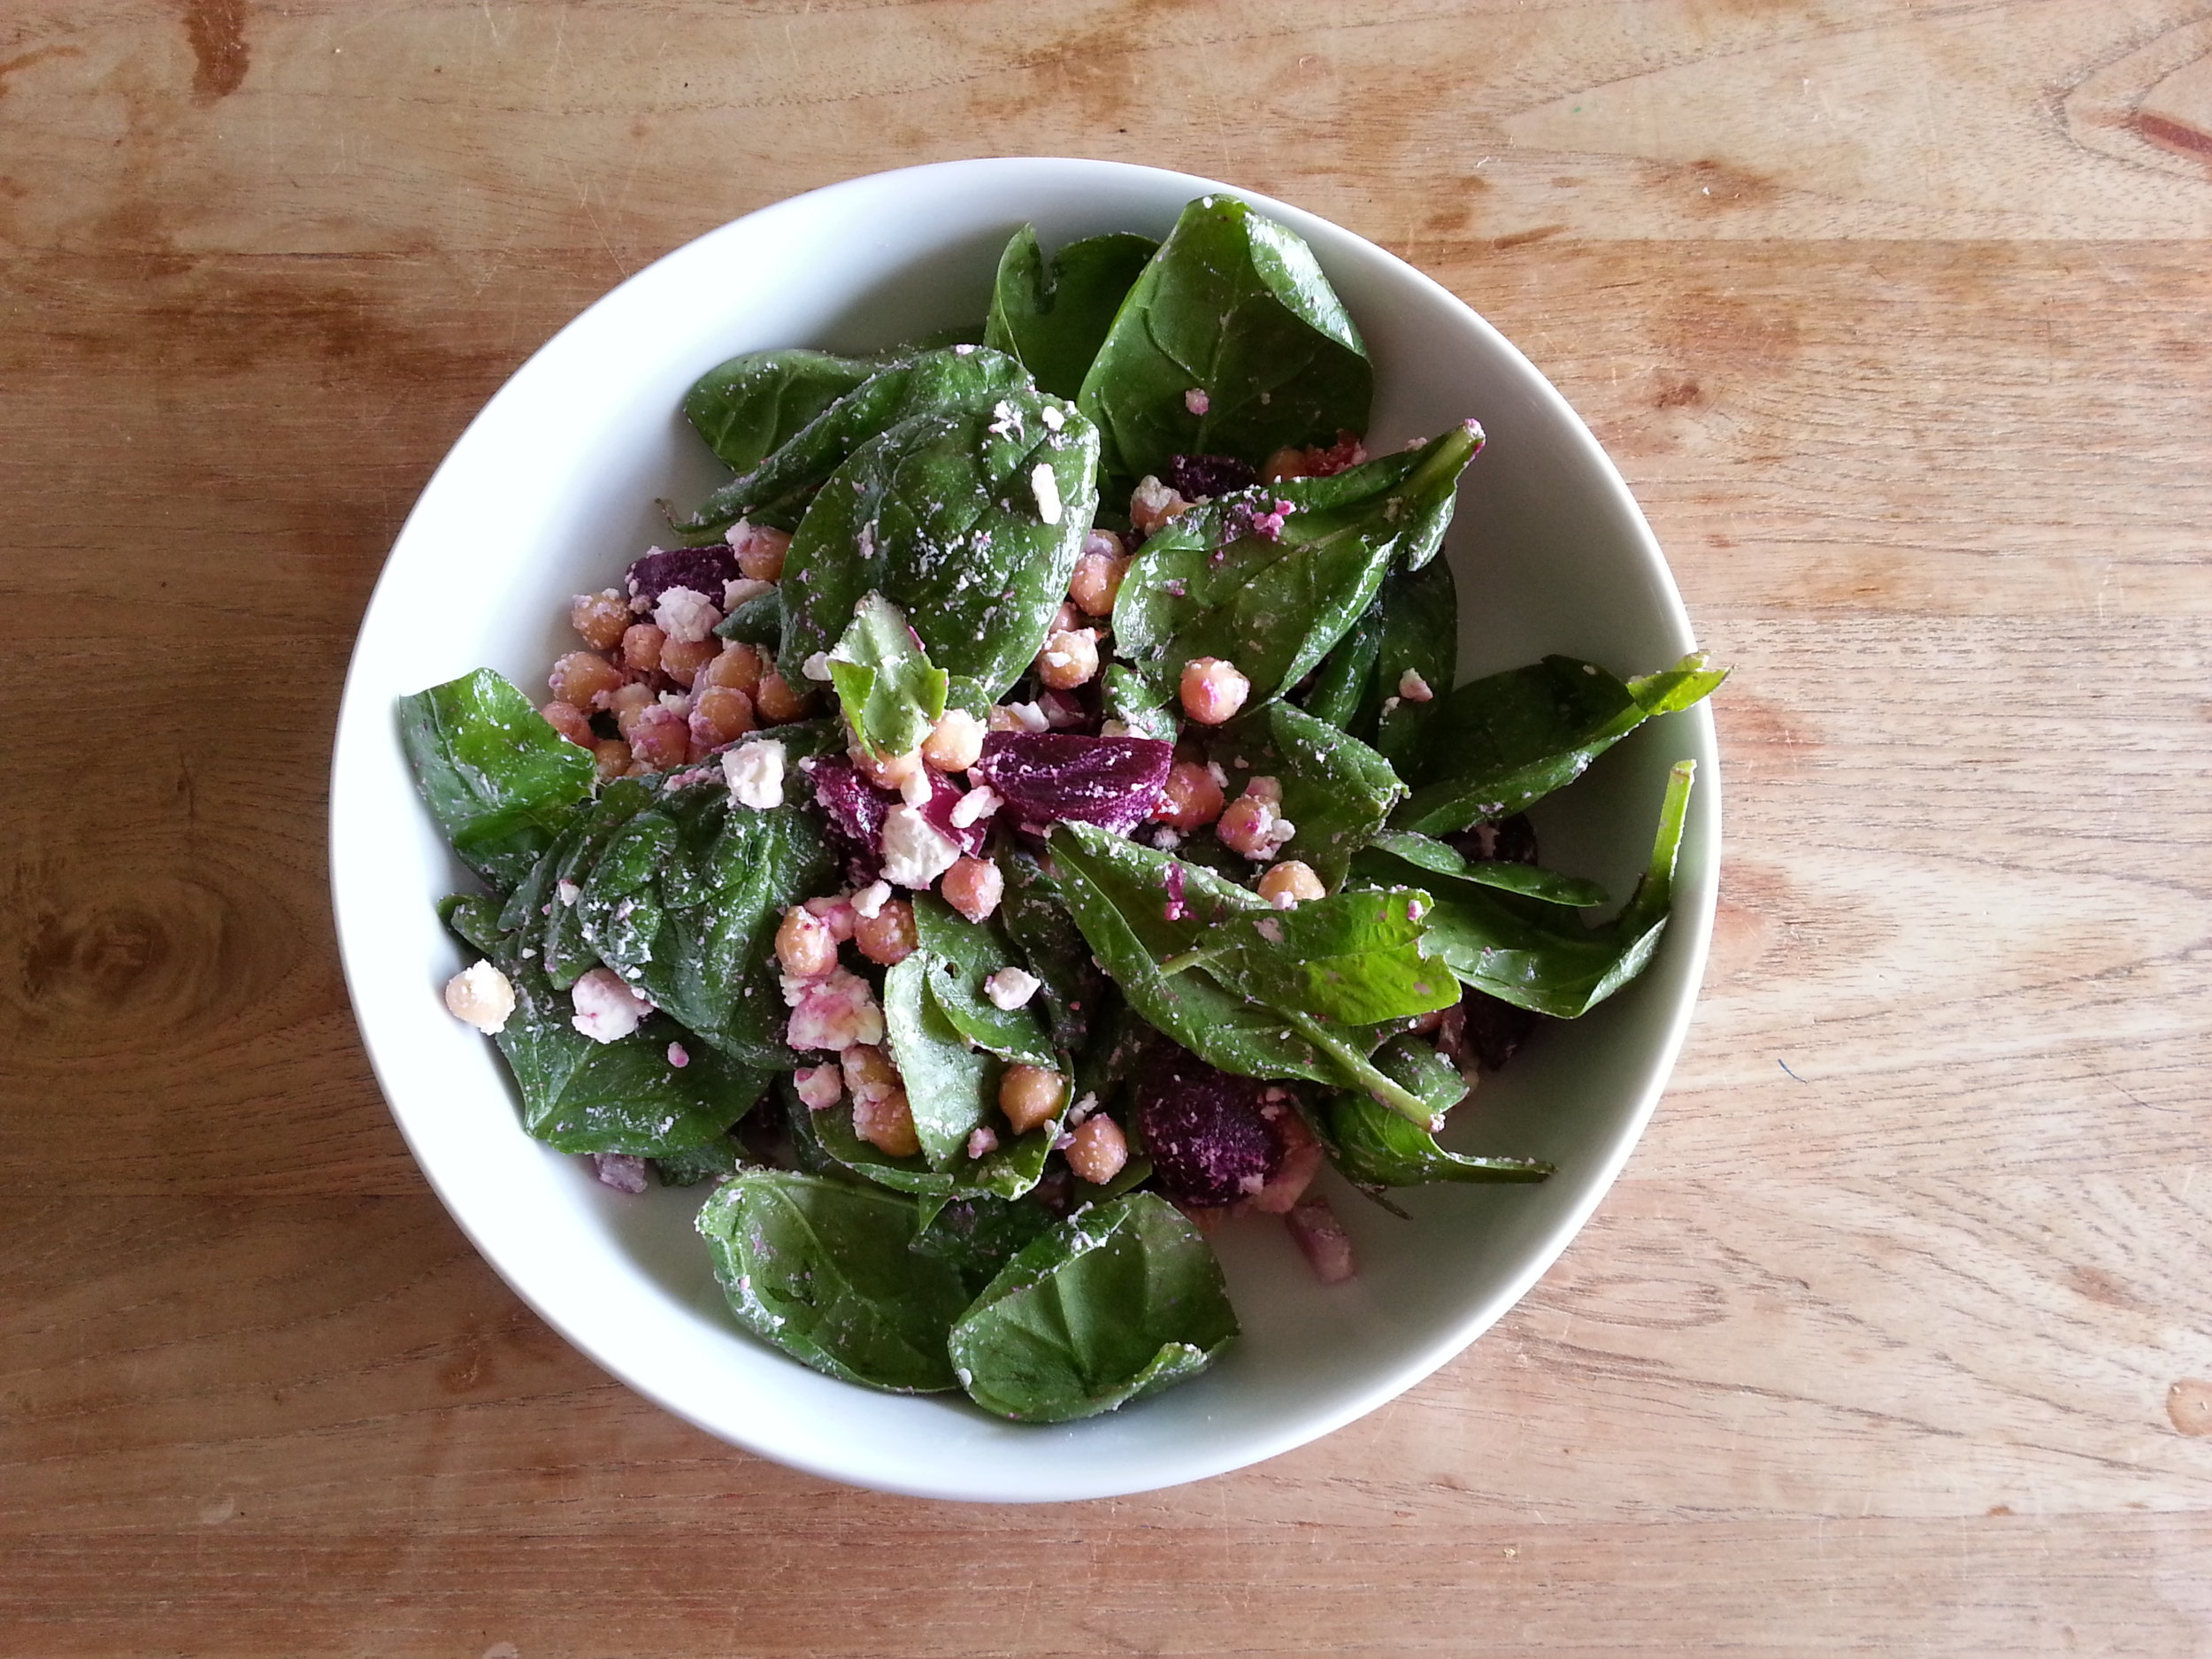 spinach-chickpeas-feta-quickhealthyfood-lunch.jpg